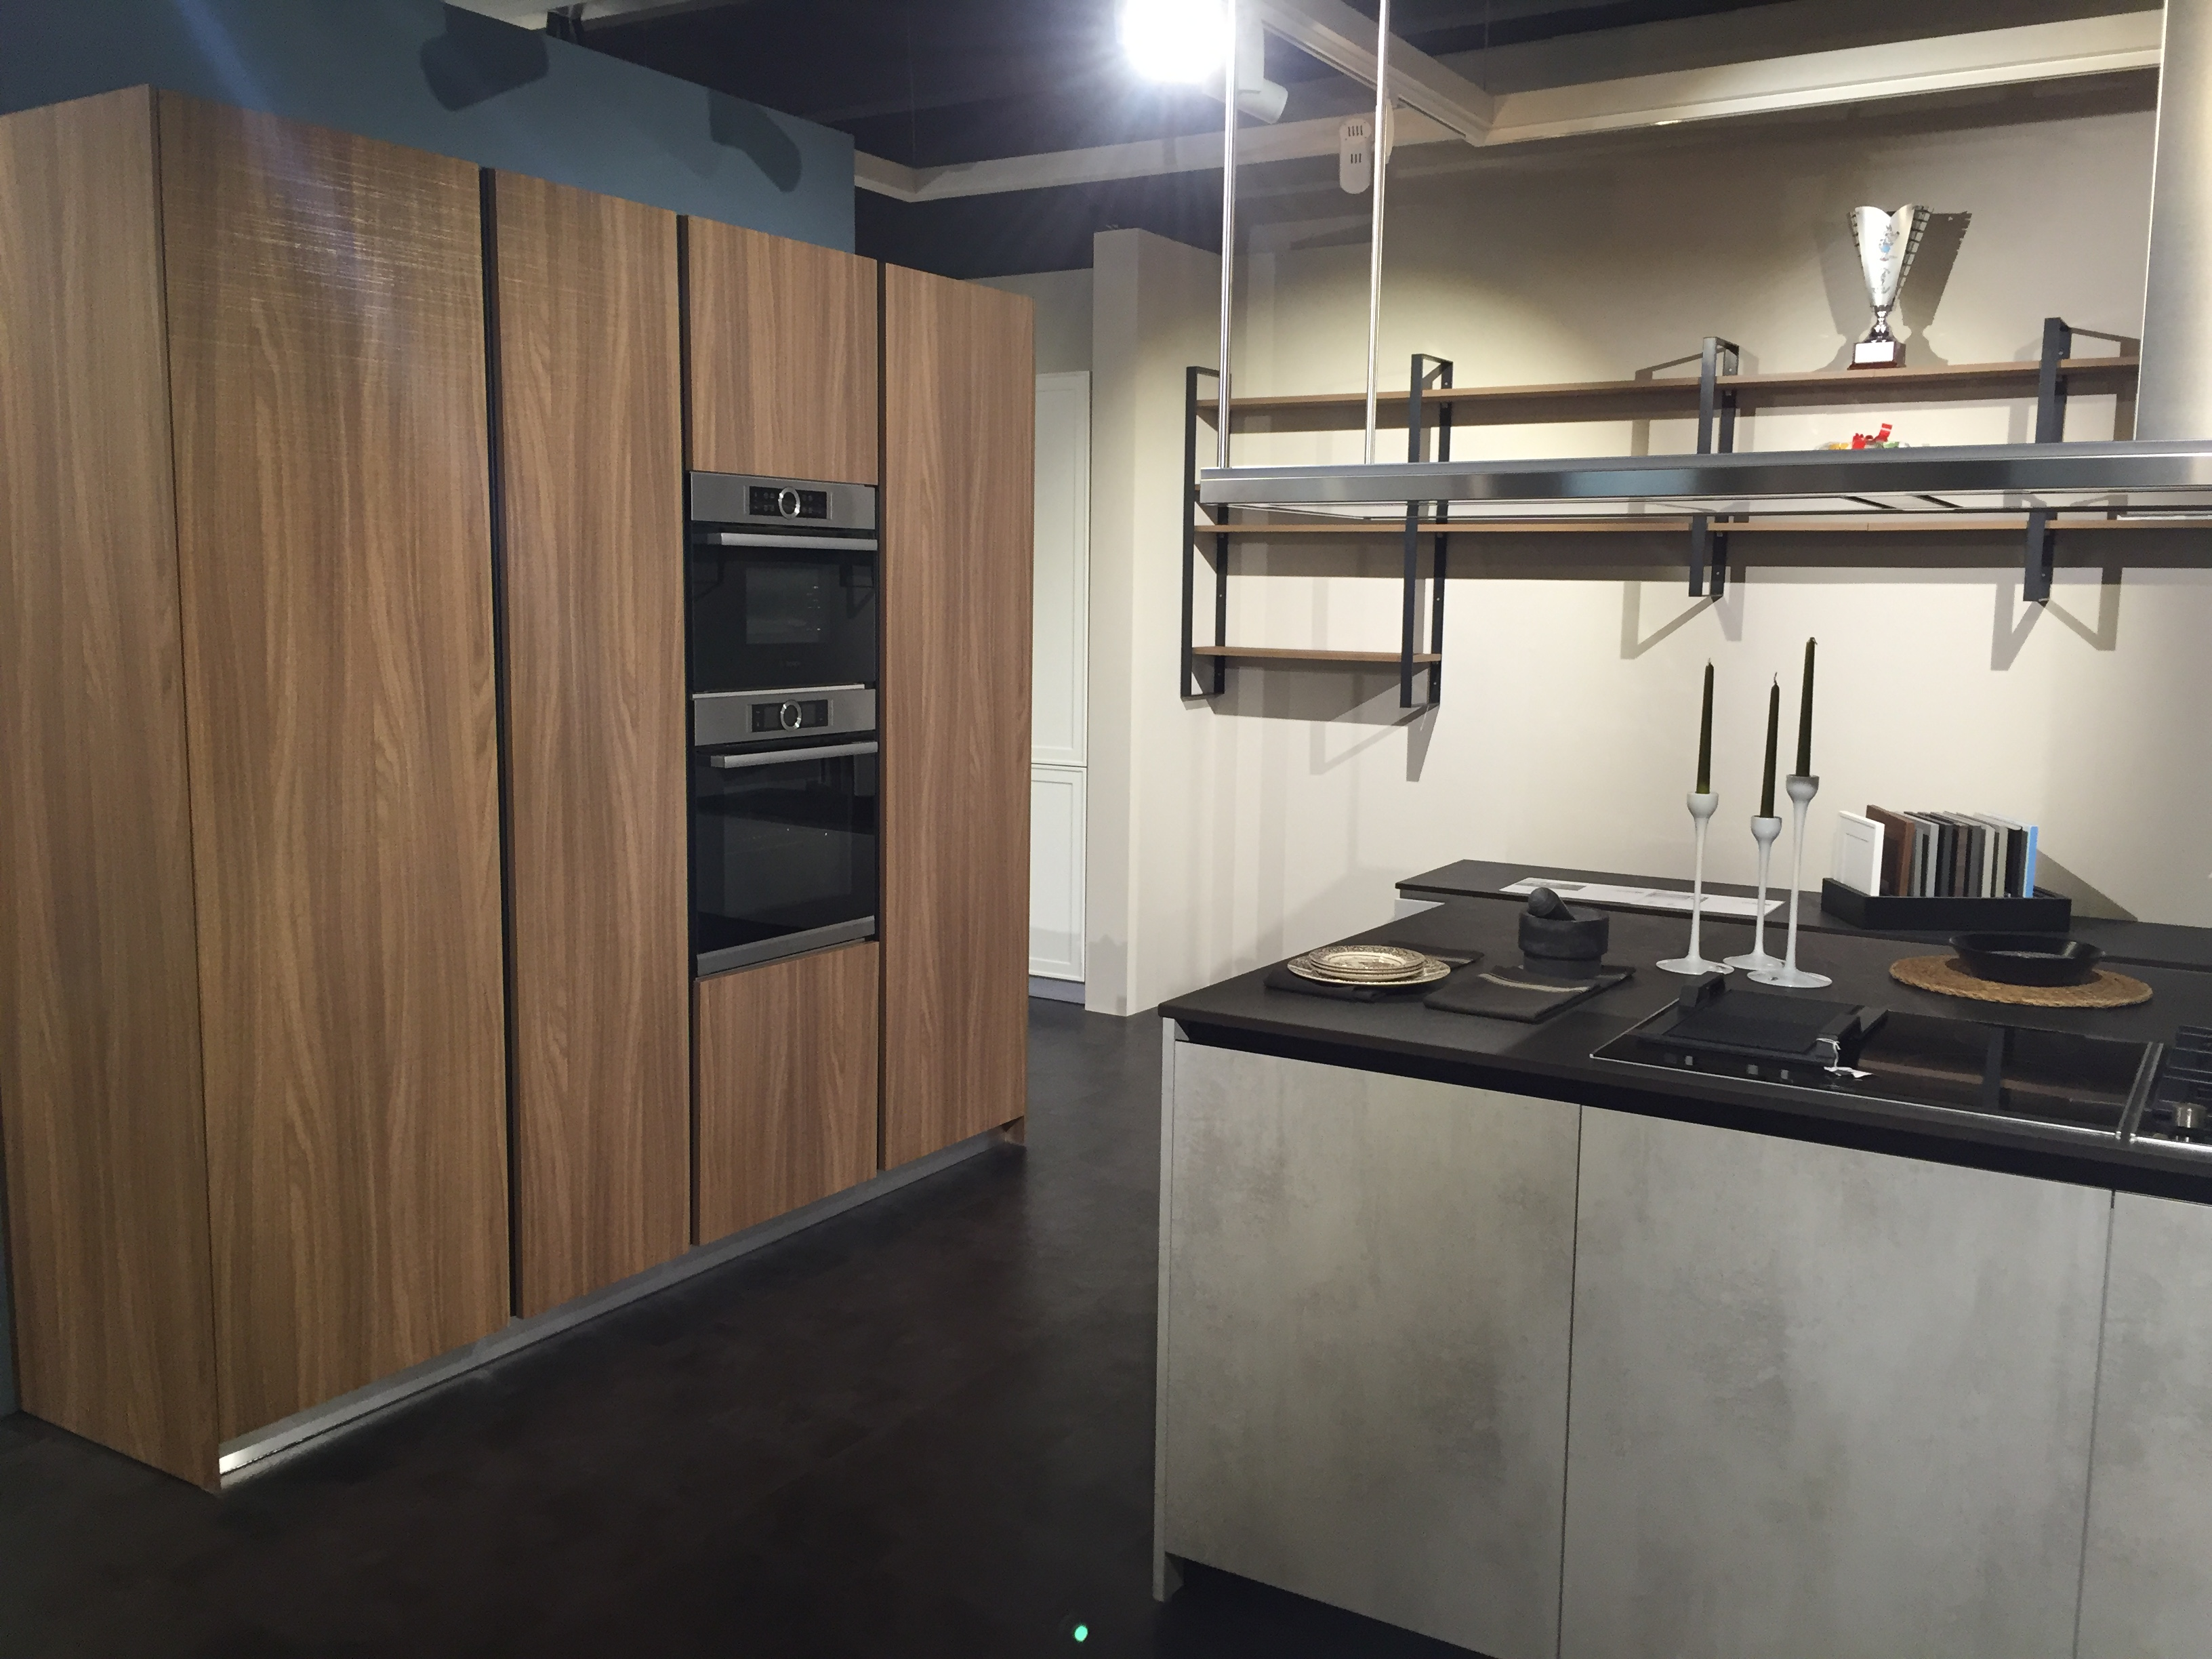 Armadio da cucina moderna mobili cucina armadio dispensa e accessori design snaidero cucina - Cucine moderne con dispensa ...